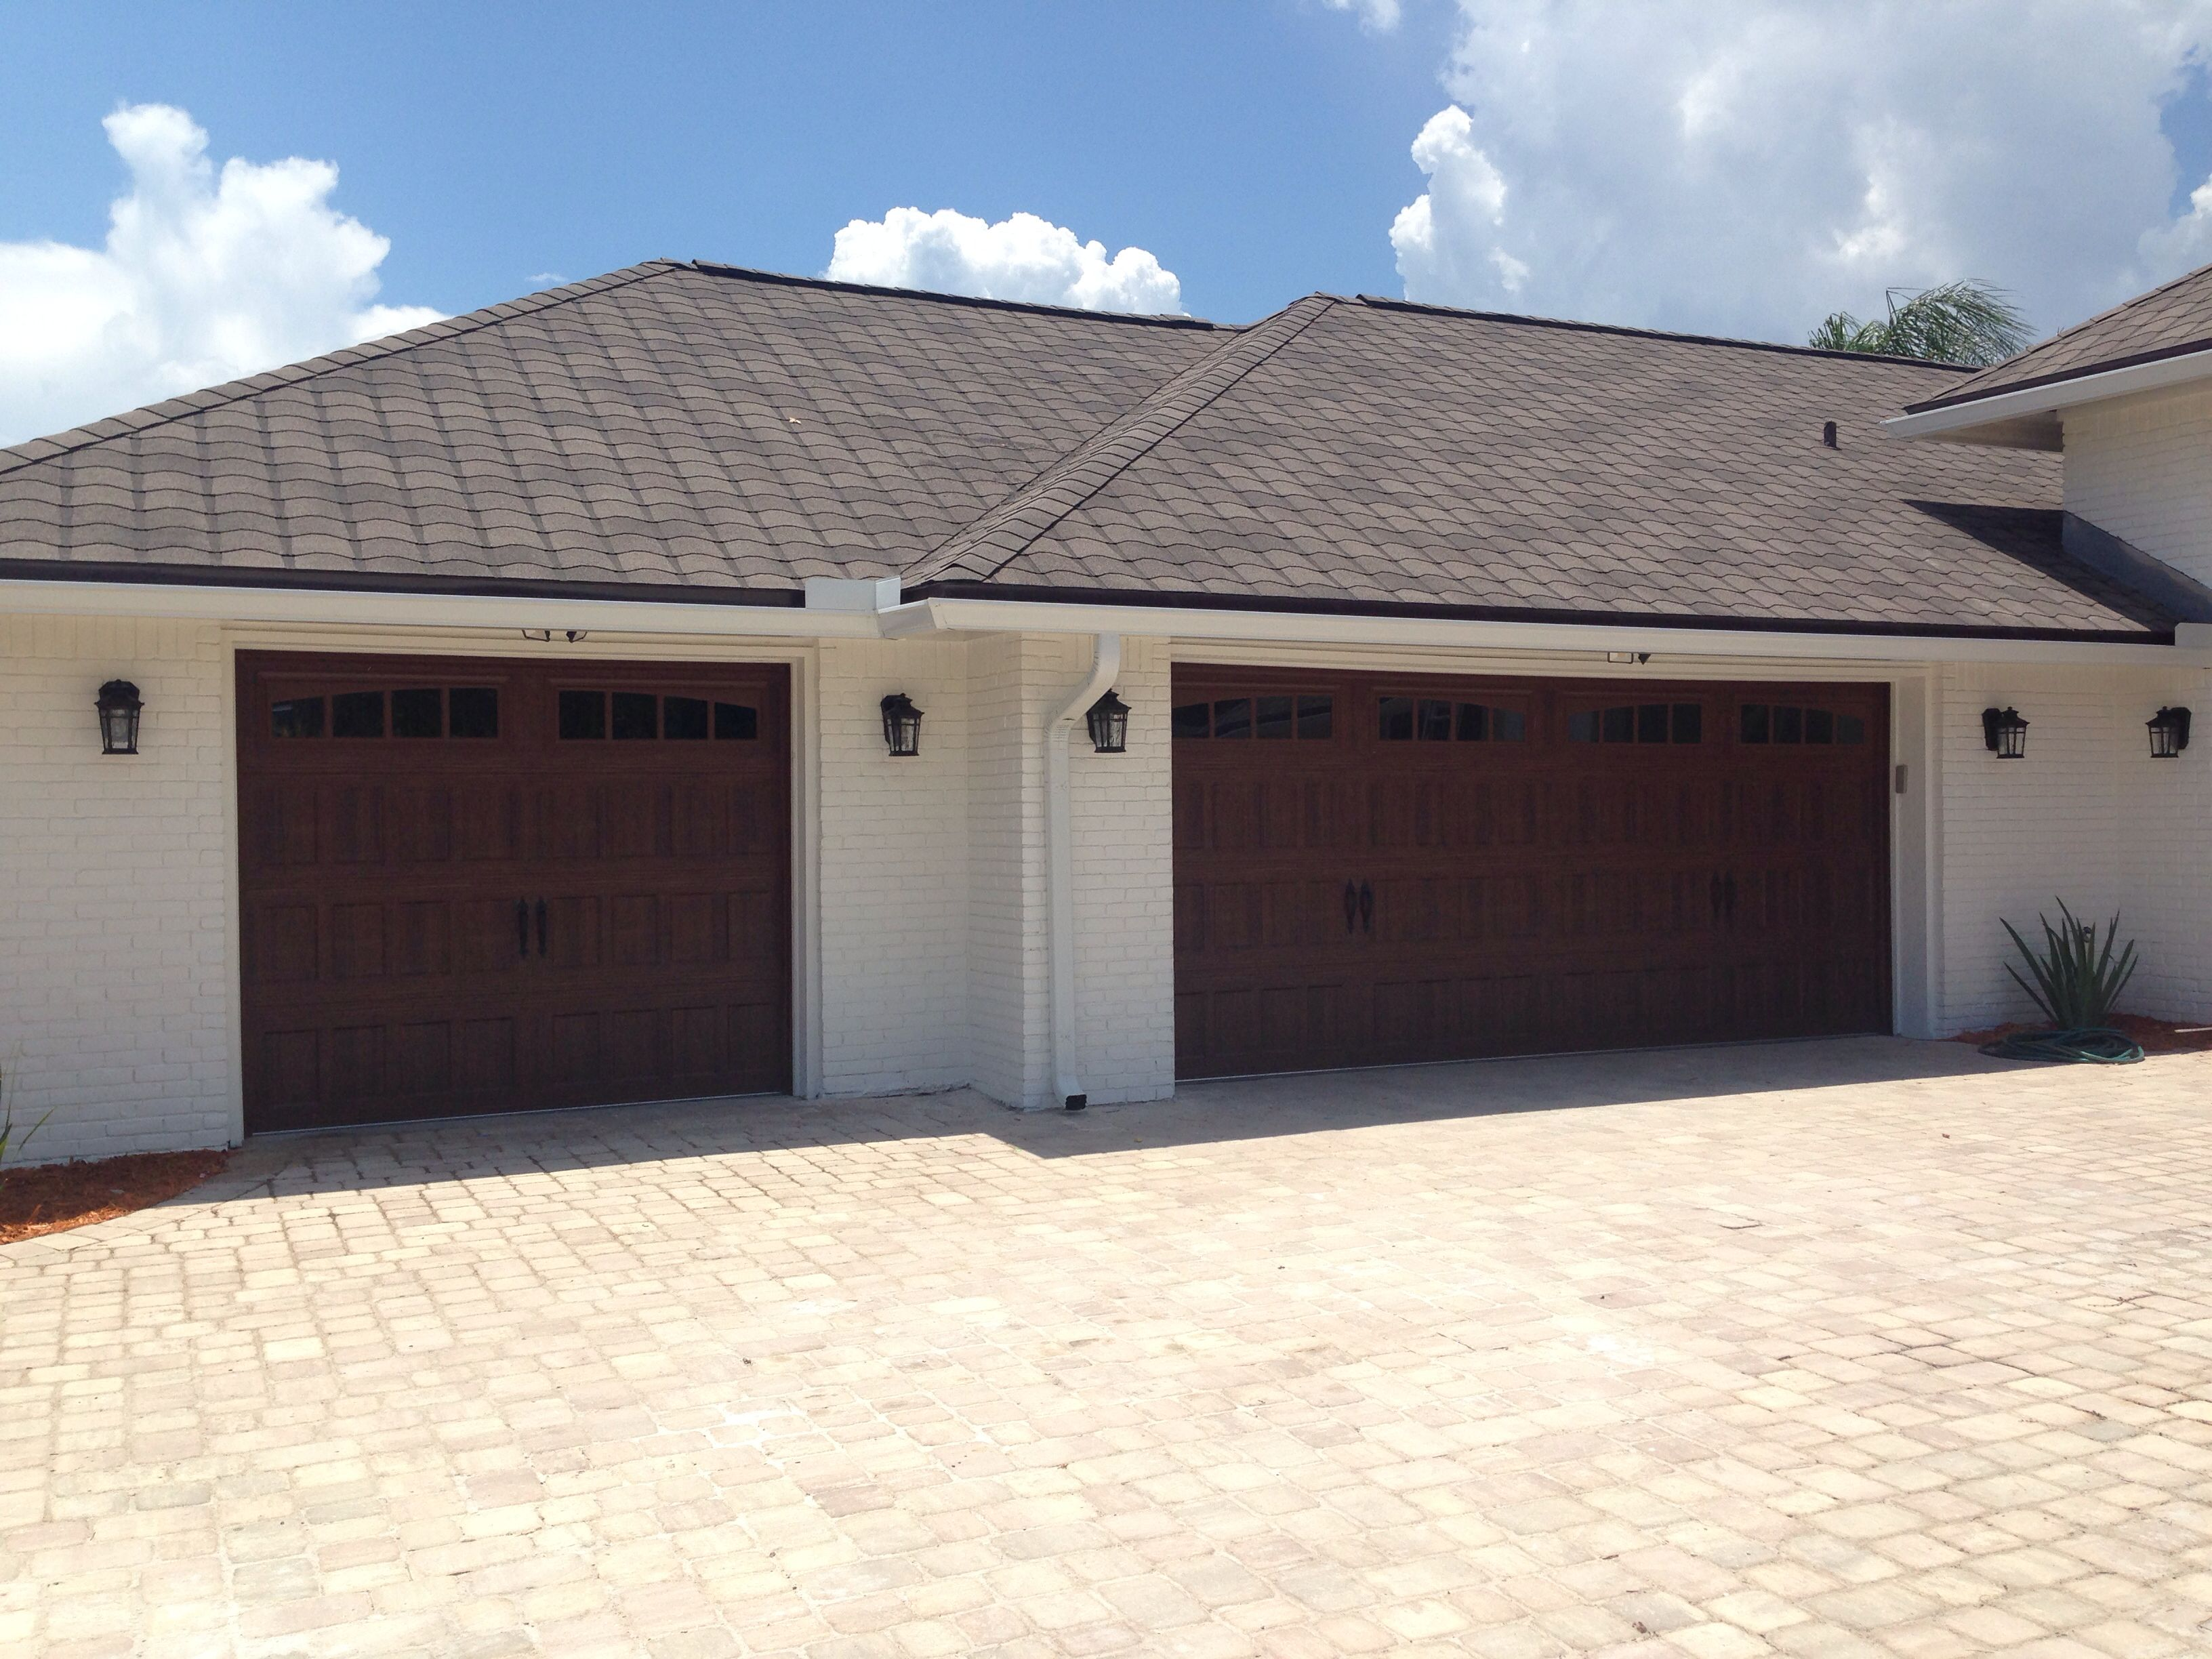 Amarr Oak Summit Garage Doors amarr oak summit 3000 garage door installed in ponte vedra beach